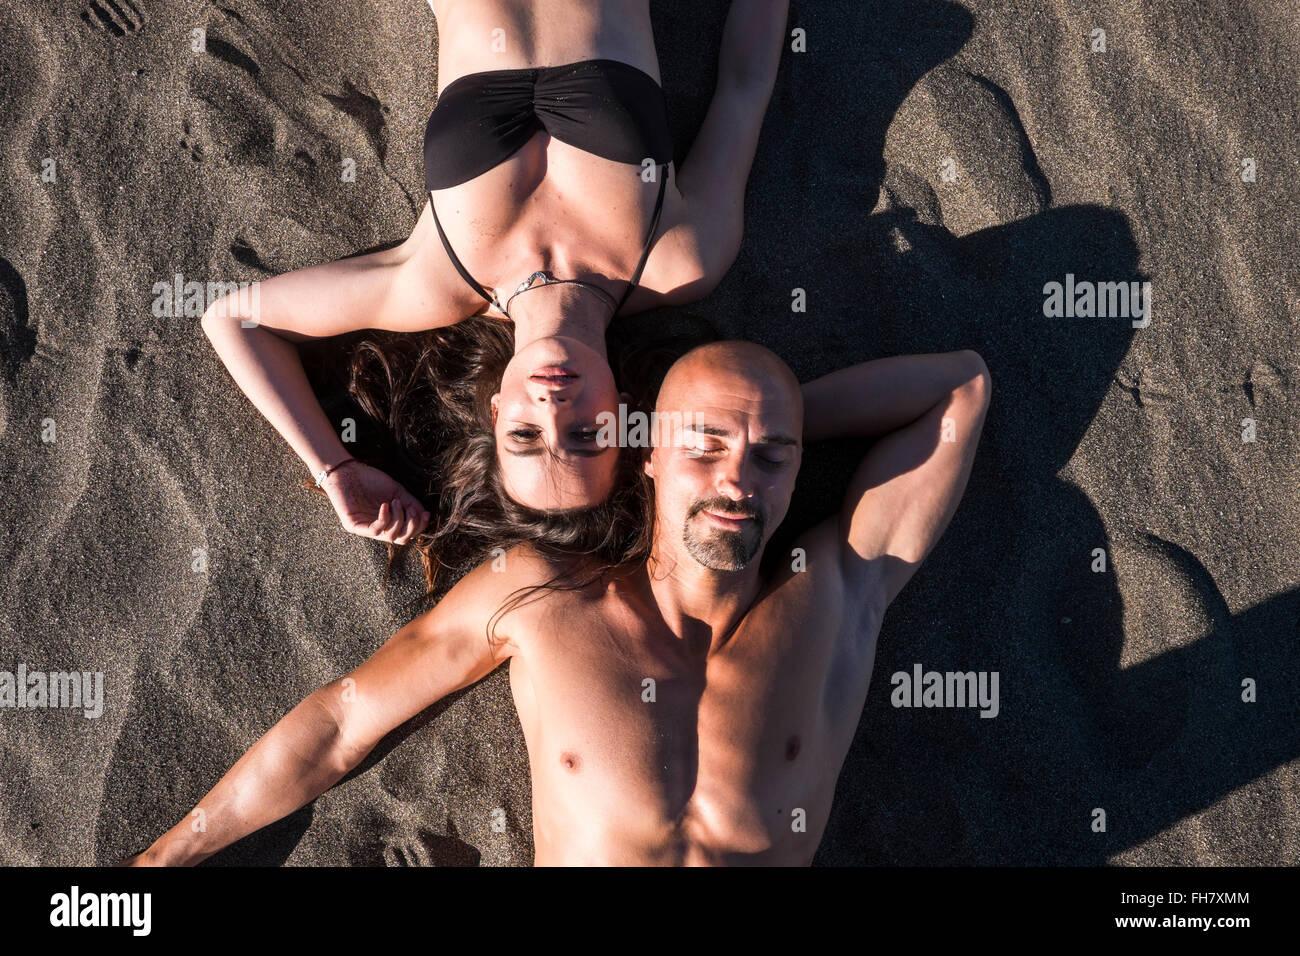 Spain, Tenerife, portrait of couple sunbathing on the beach - Stock Image